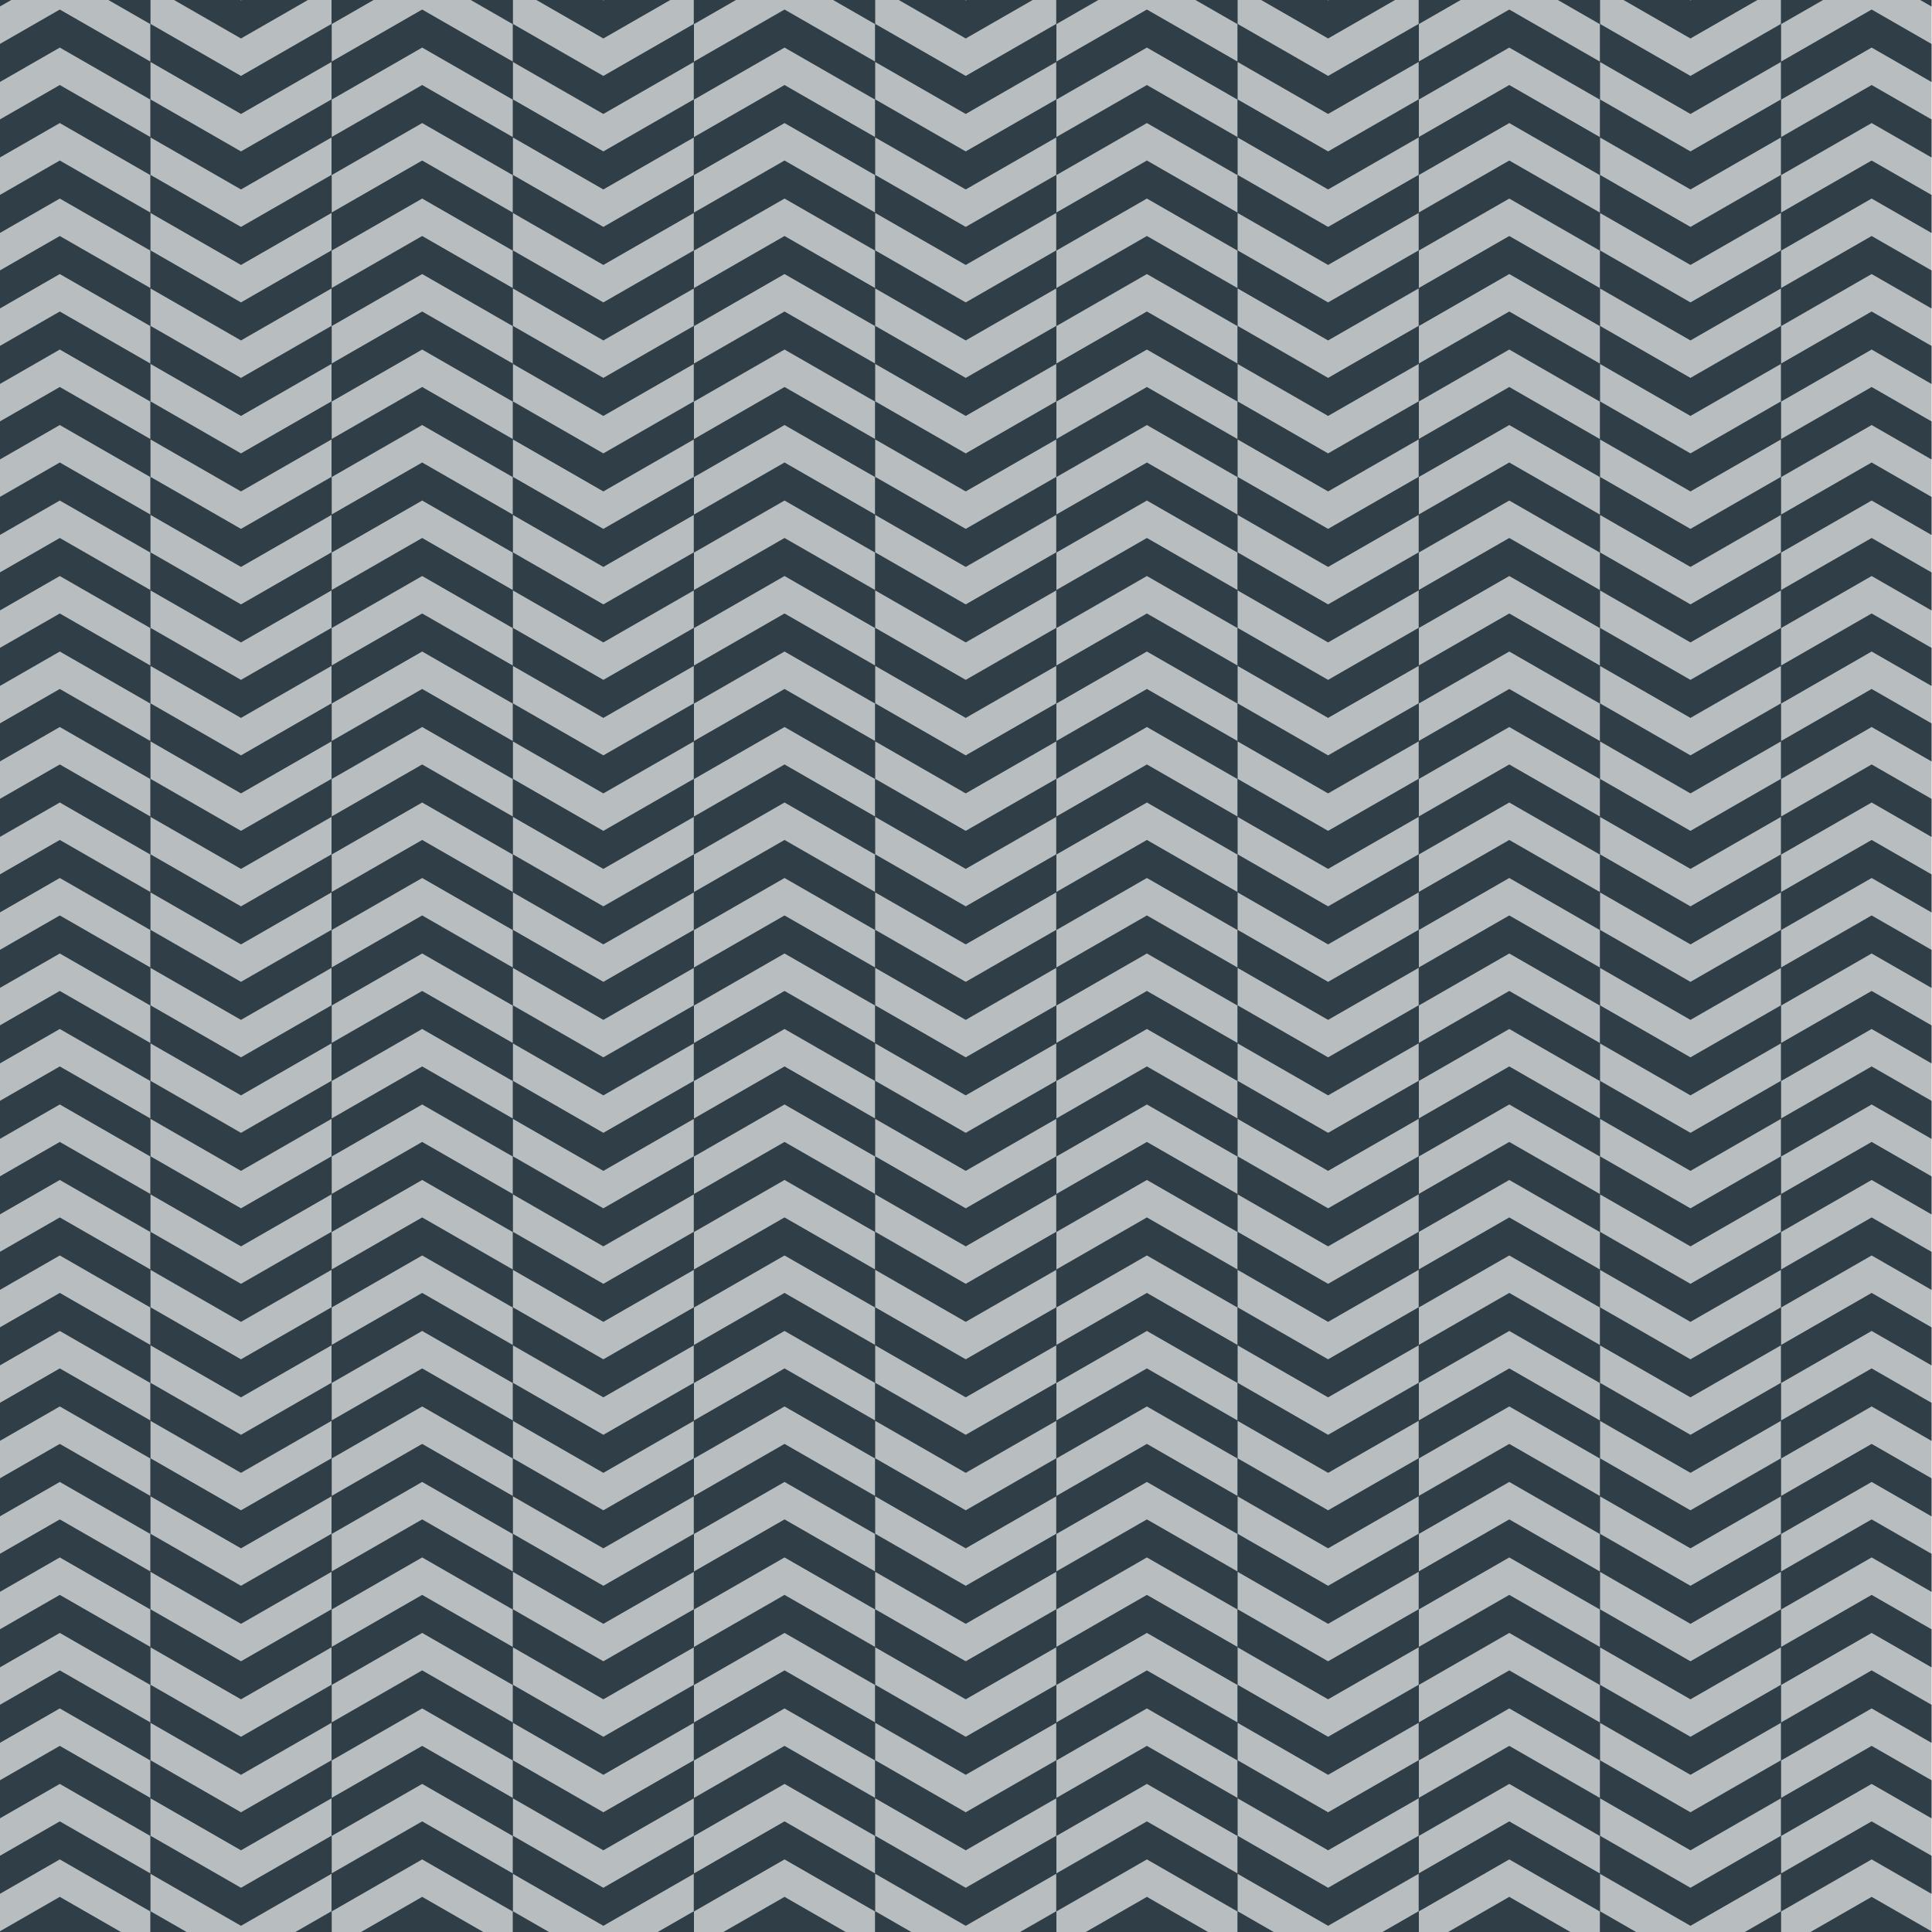 Flight Deck 53 brand pattern – Design by Ian Whalley